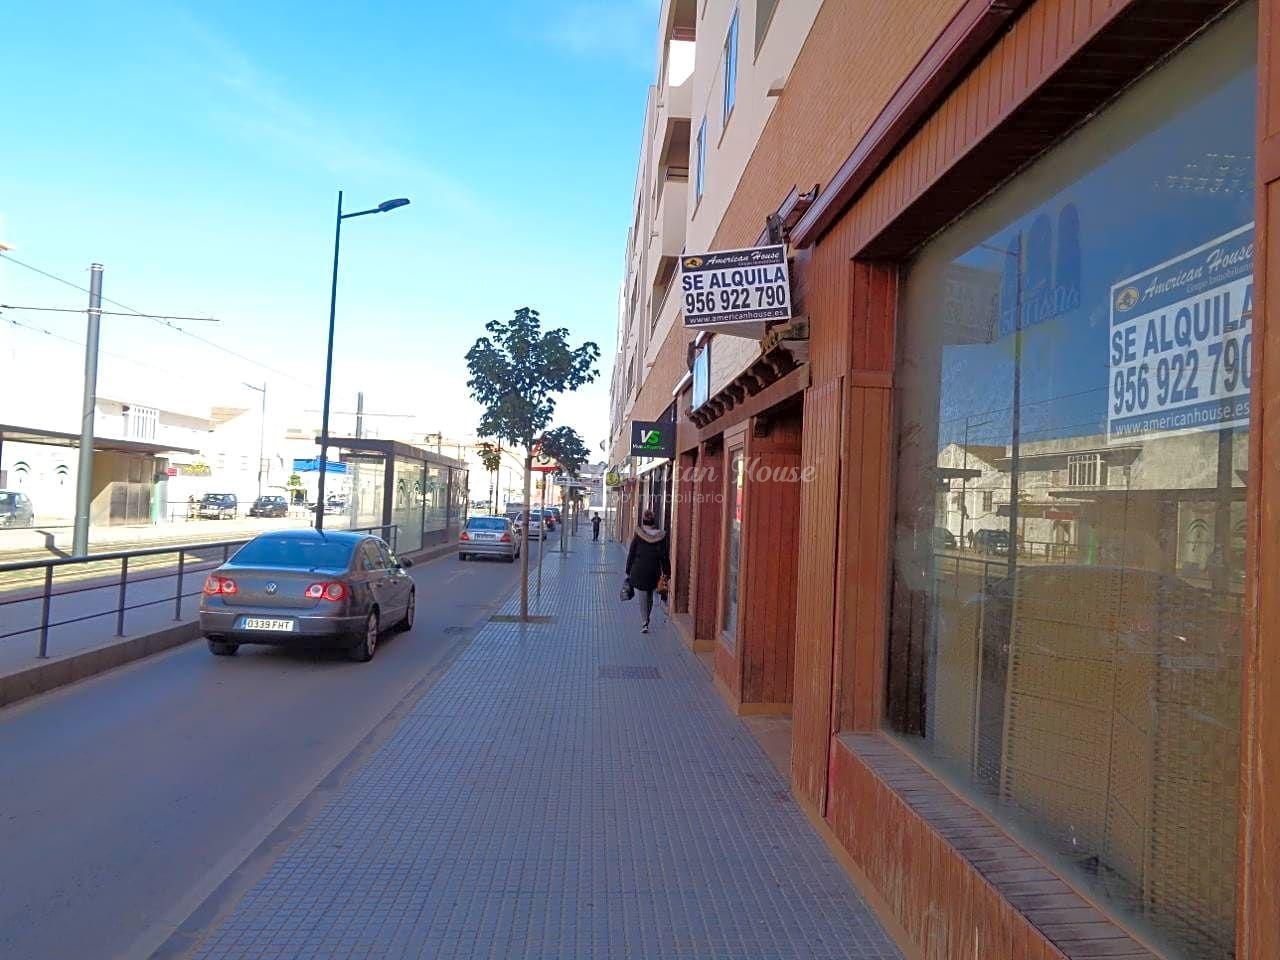 Se Alquila Gran Restaurante Céntrico en Alameda Solano, Chiclana de la Fra., Cádiz